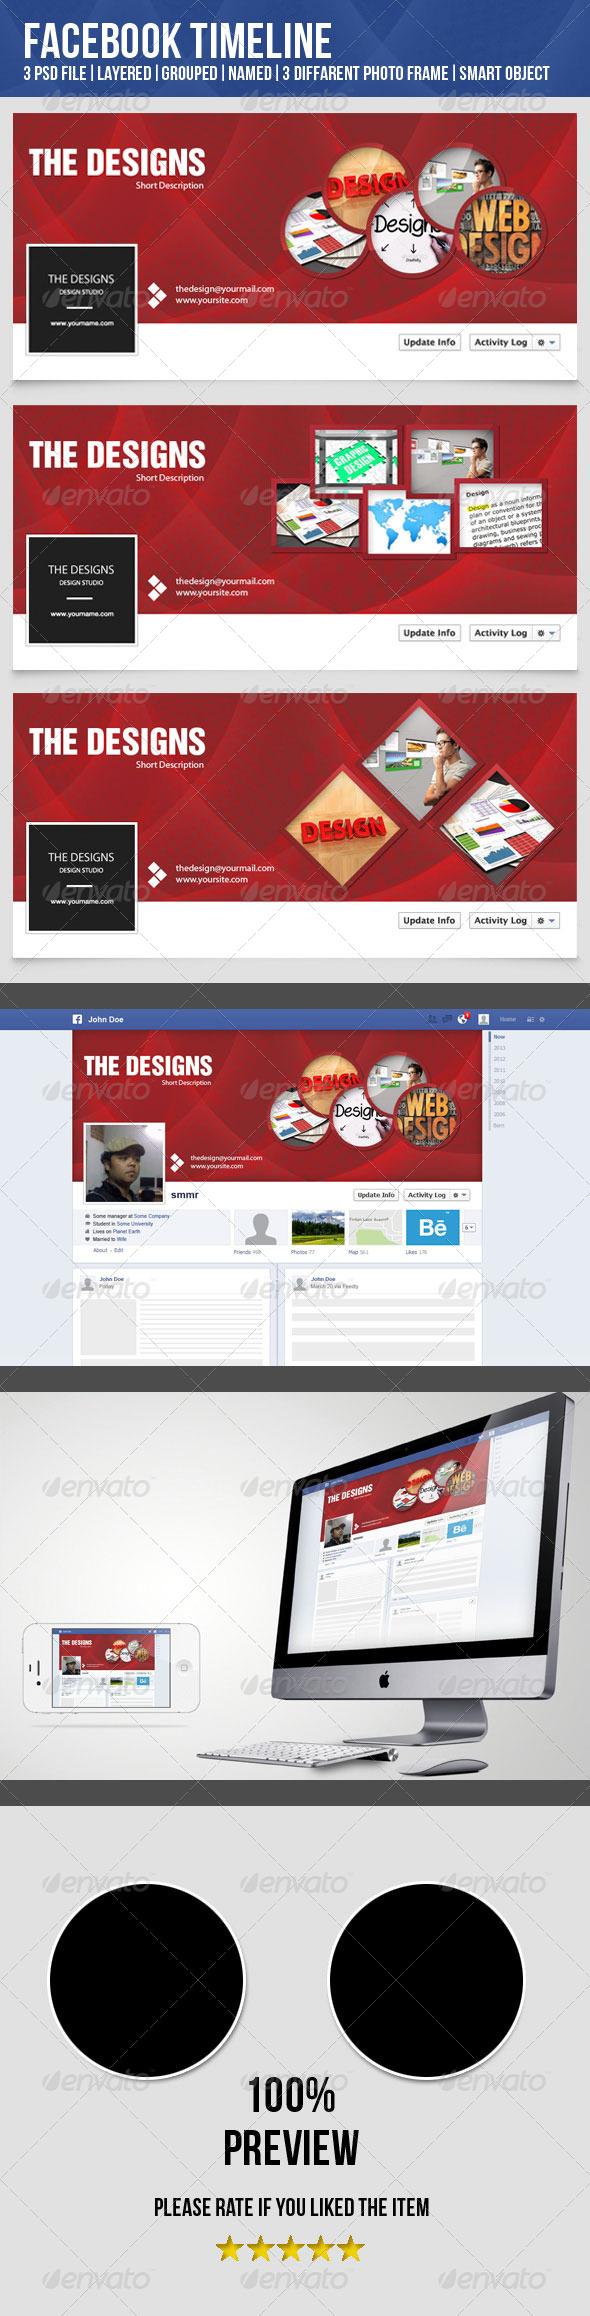 GraphicRiver Facebook Timeline-Design Studio 4918556